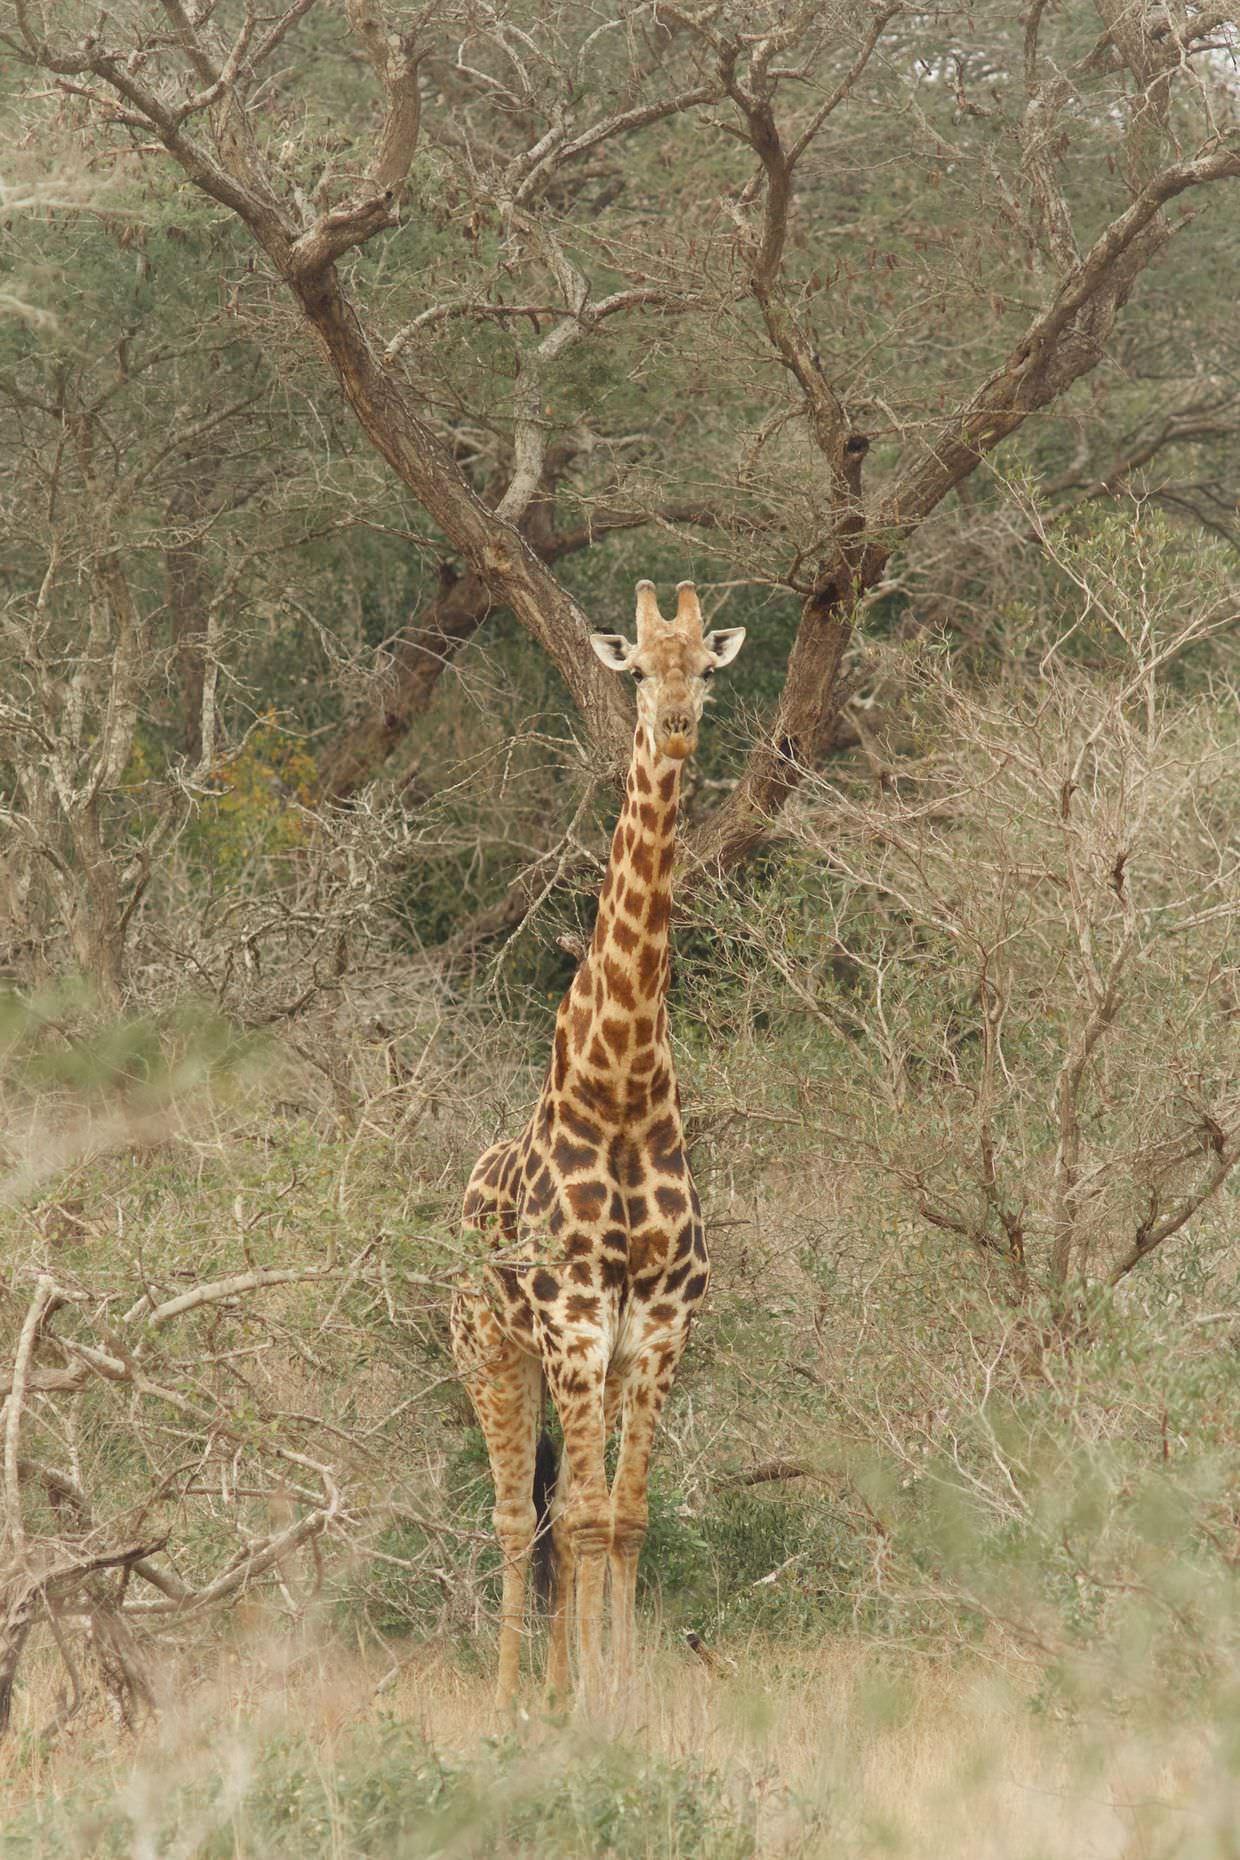 Anxious giraffe